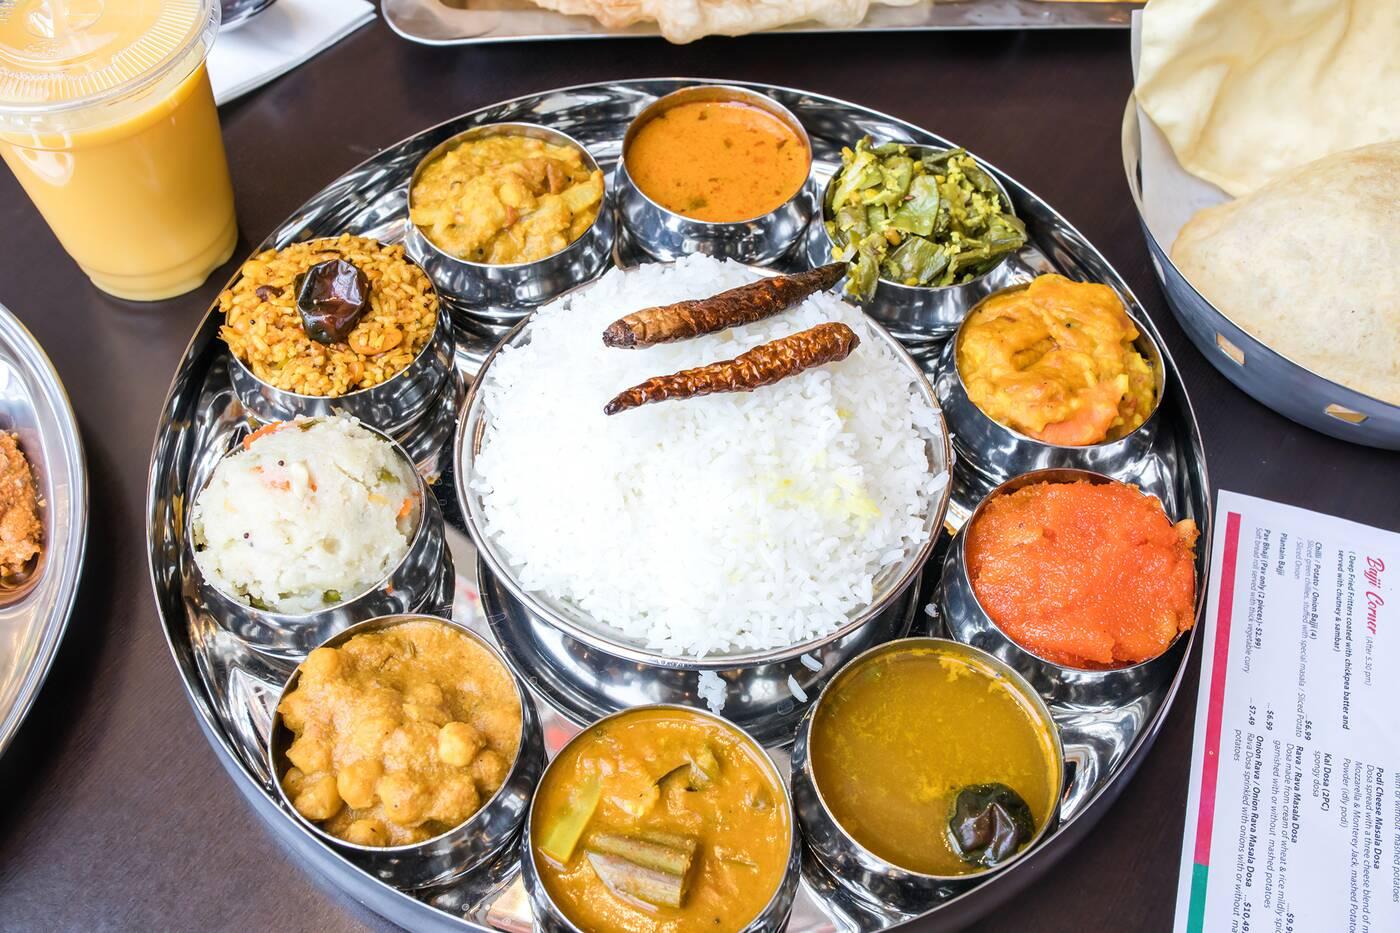 saravanaa bhavan toronto